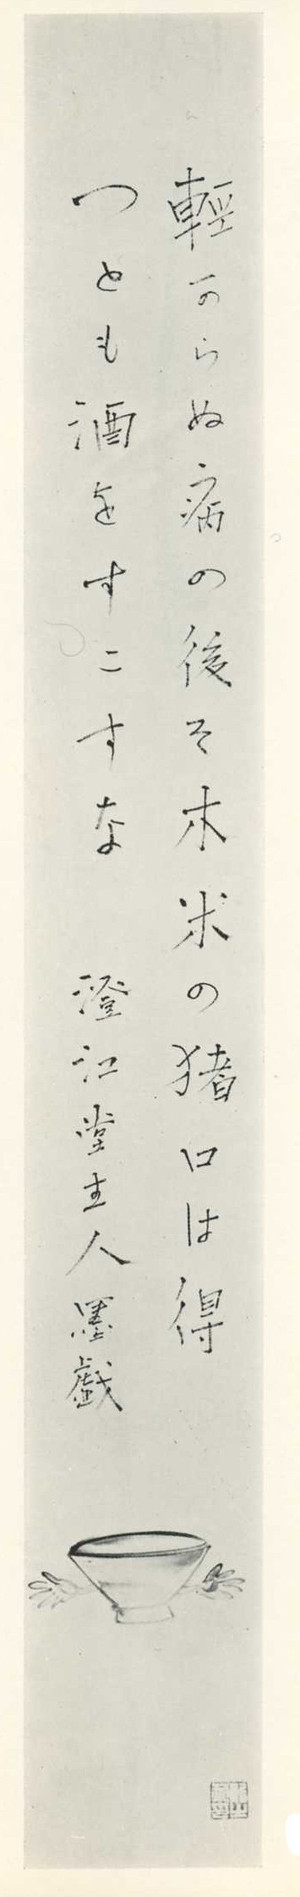 Hainozujigasan